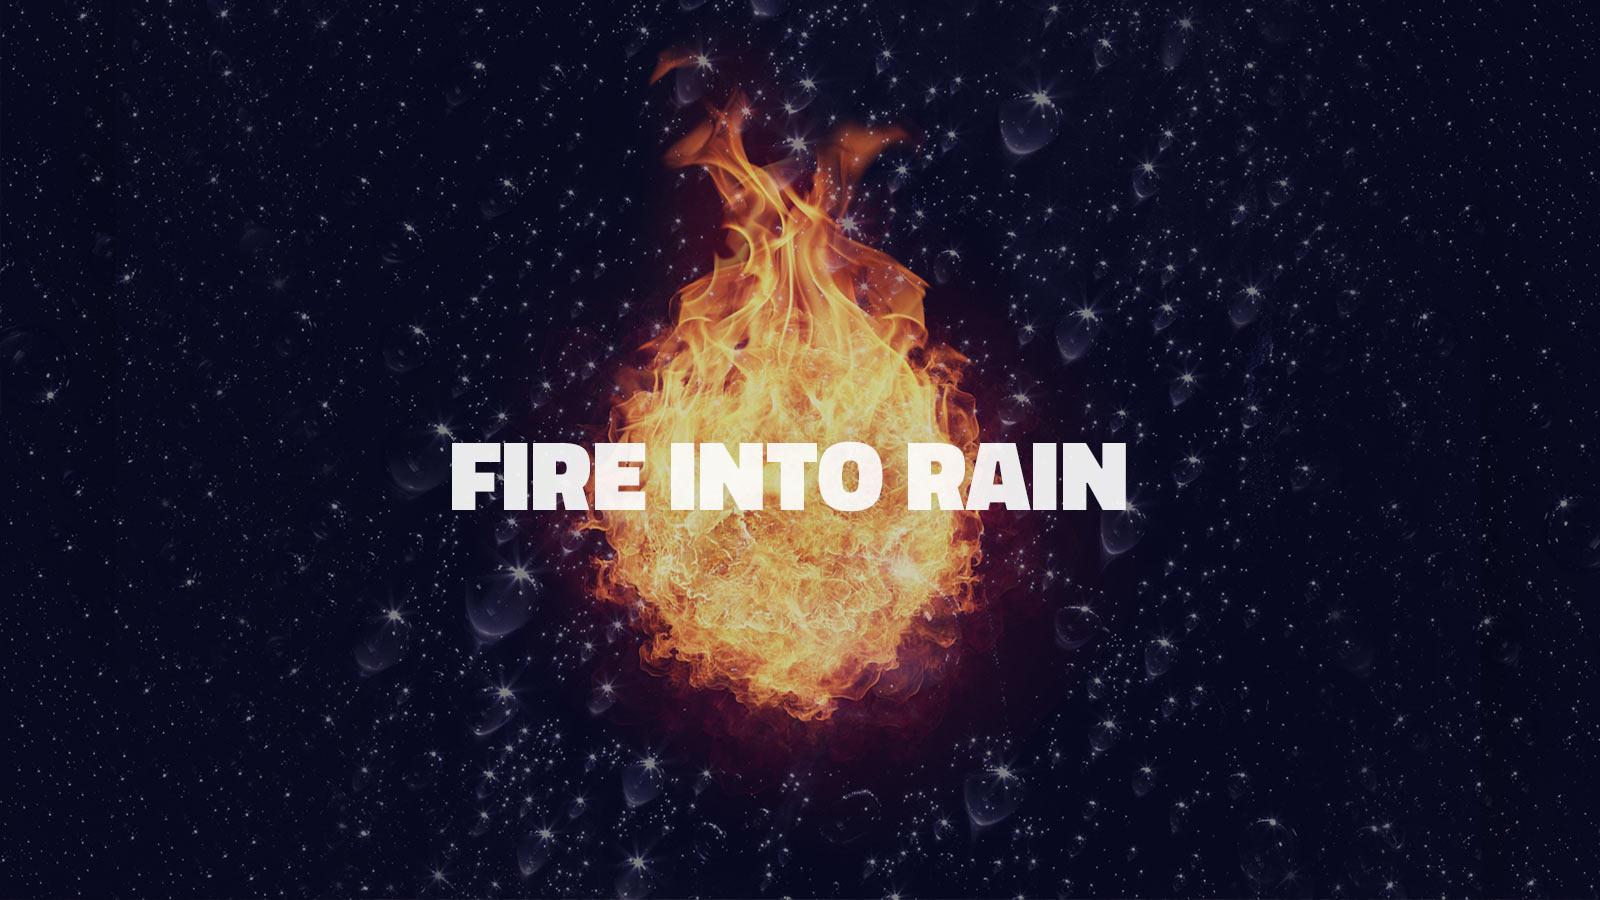 Turning Fire into Rain